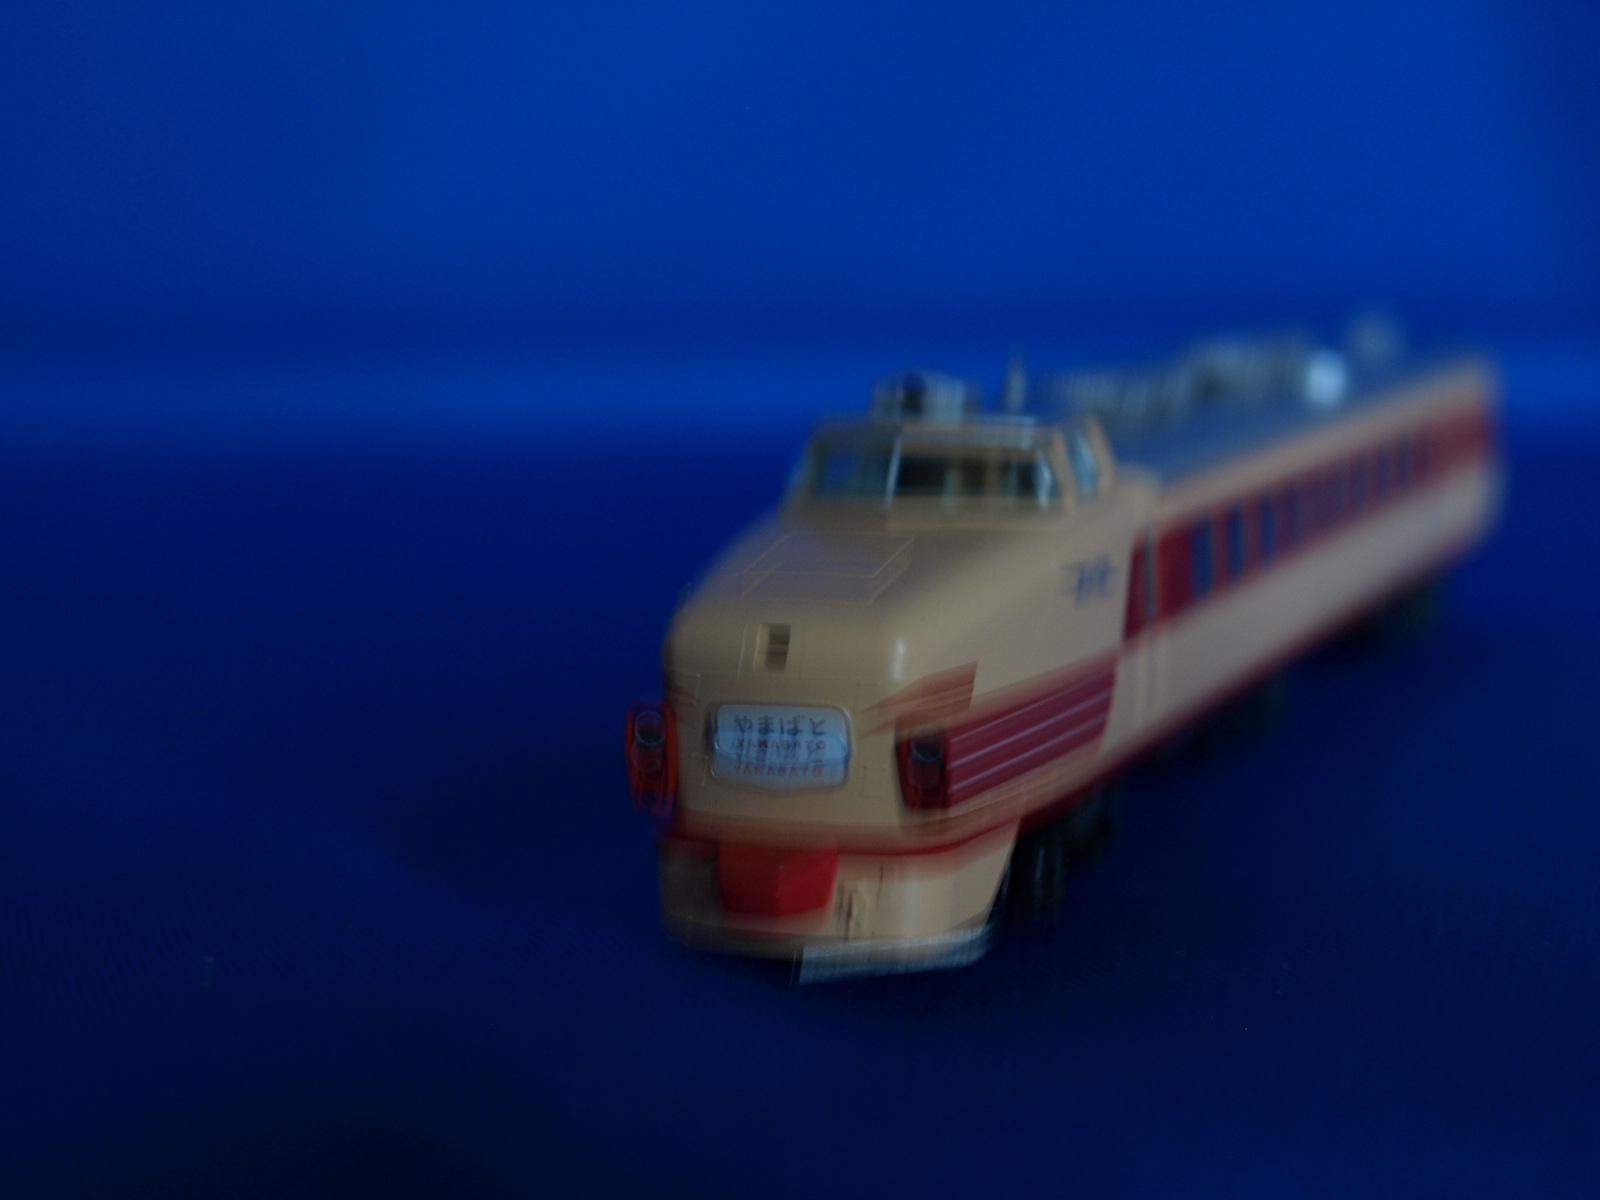 Nゲージ トミックス 98994  限定品 国鉄 485系特急電車(やまばと・あいづ)(室内灯入り9両)セット